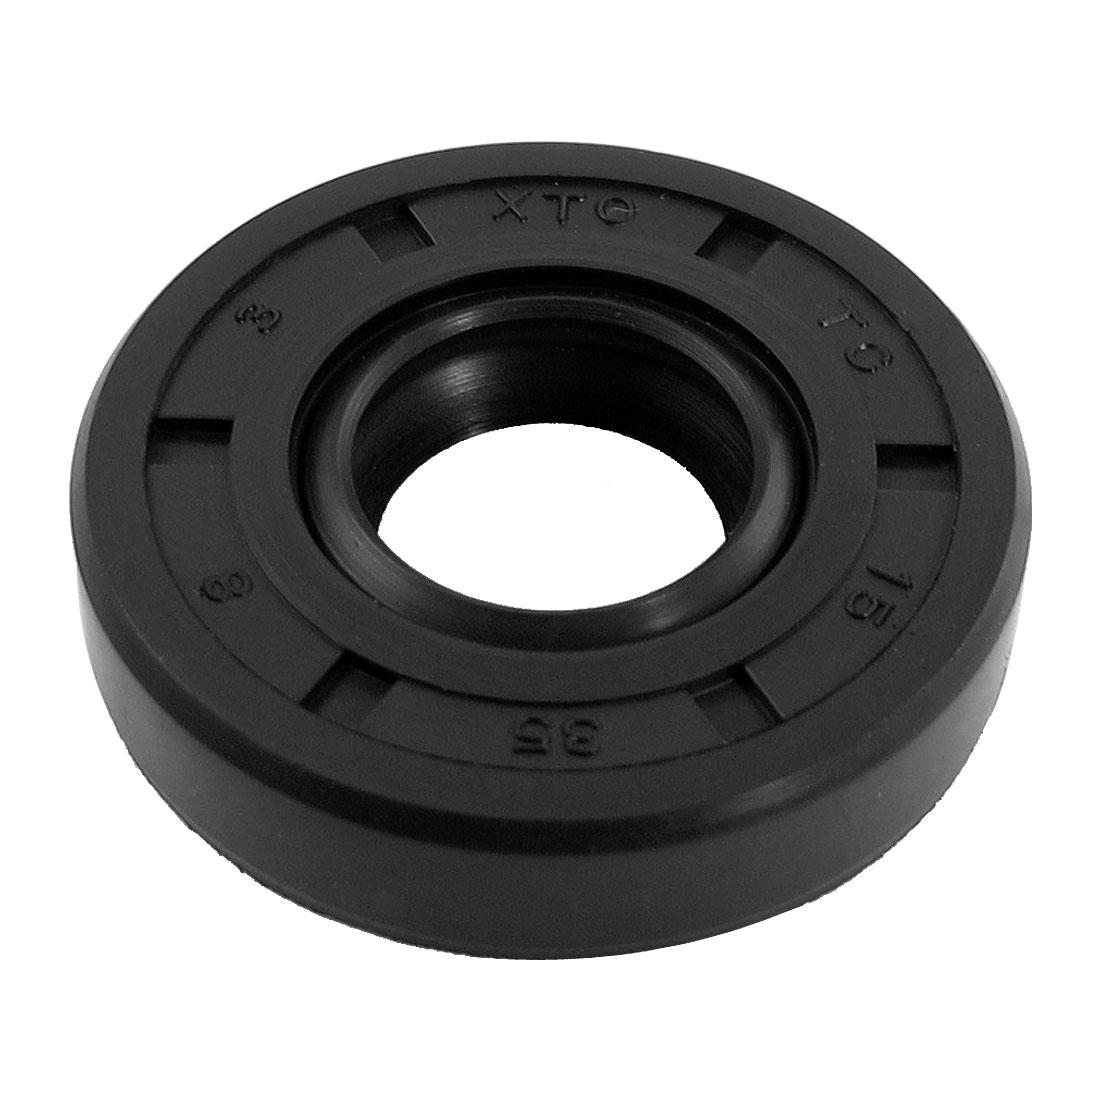 Black Nitrile Rubber Dual Lips Oil Shaft Seal TC 15mm x 35mm x 8mm